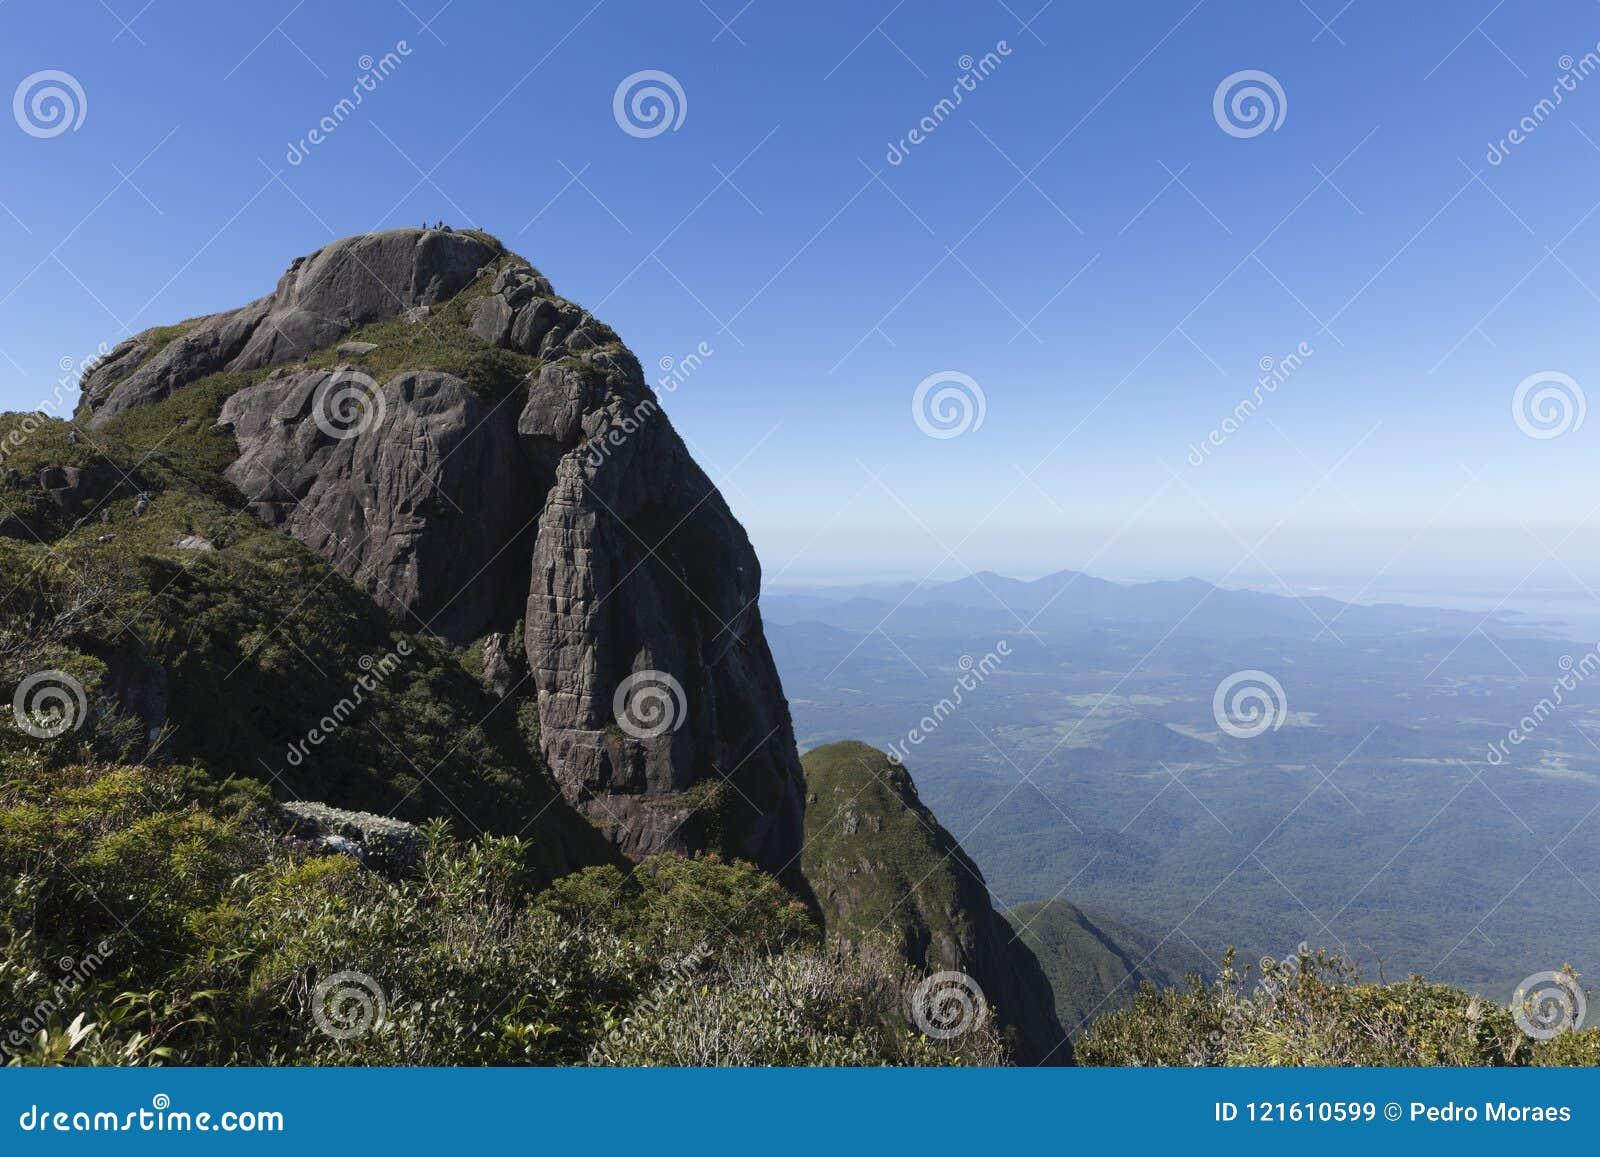 Pico Parana-berg dichtbij Curitiba - Serra do Ibitiraquire